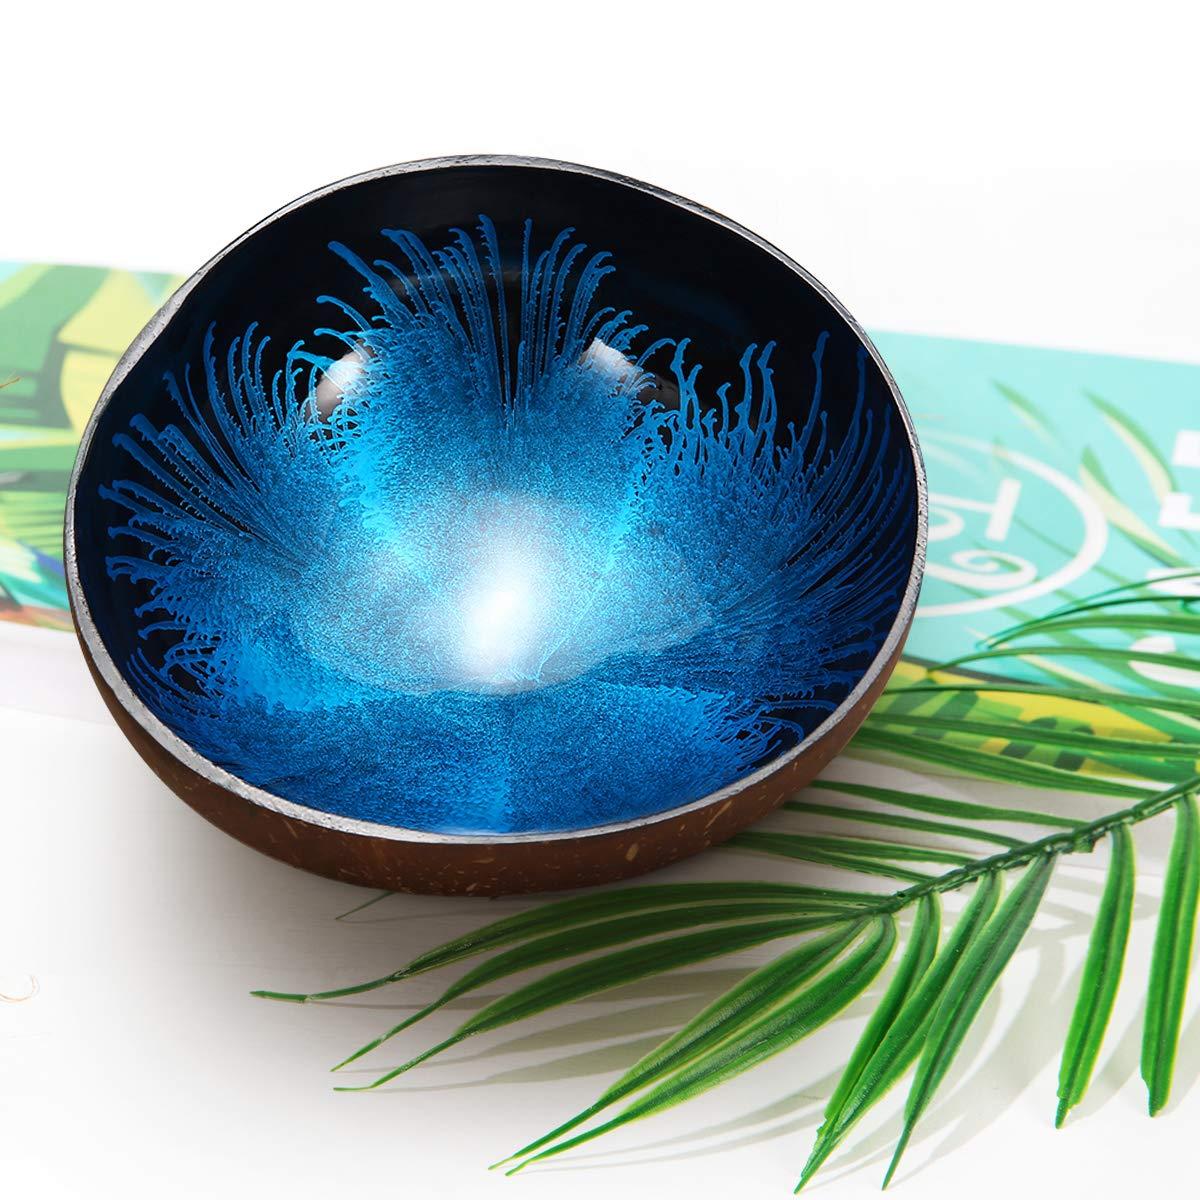 Matte Black Decorative Bowl with Copper Interior for Potpourri Keys or Fruit